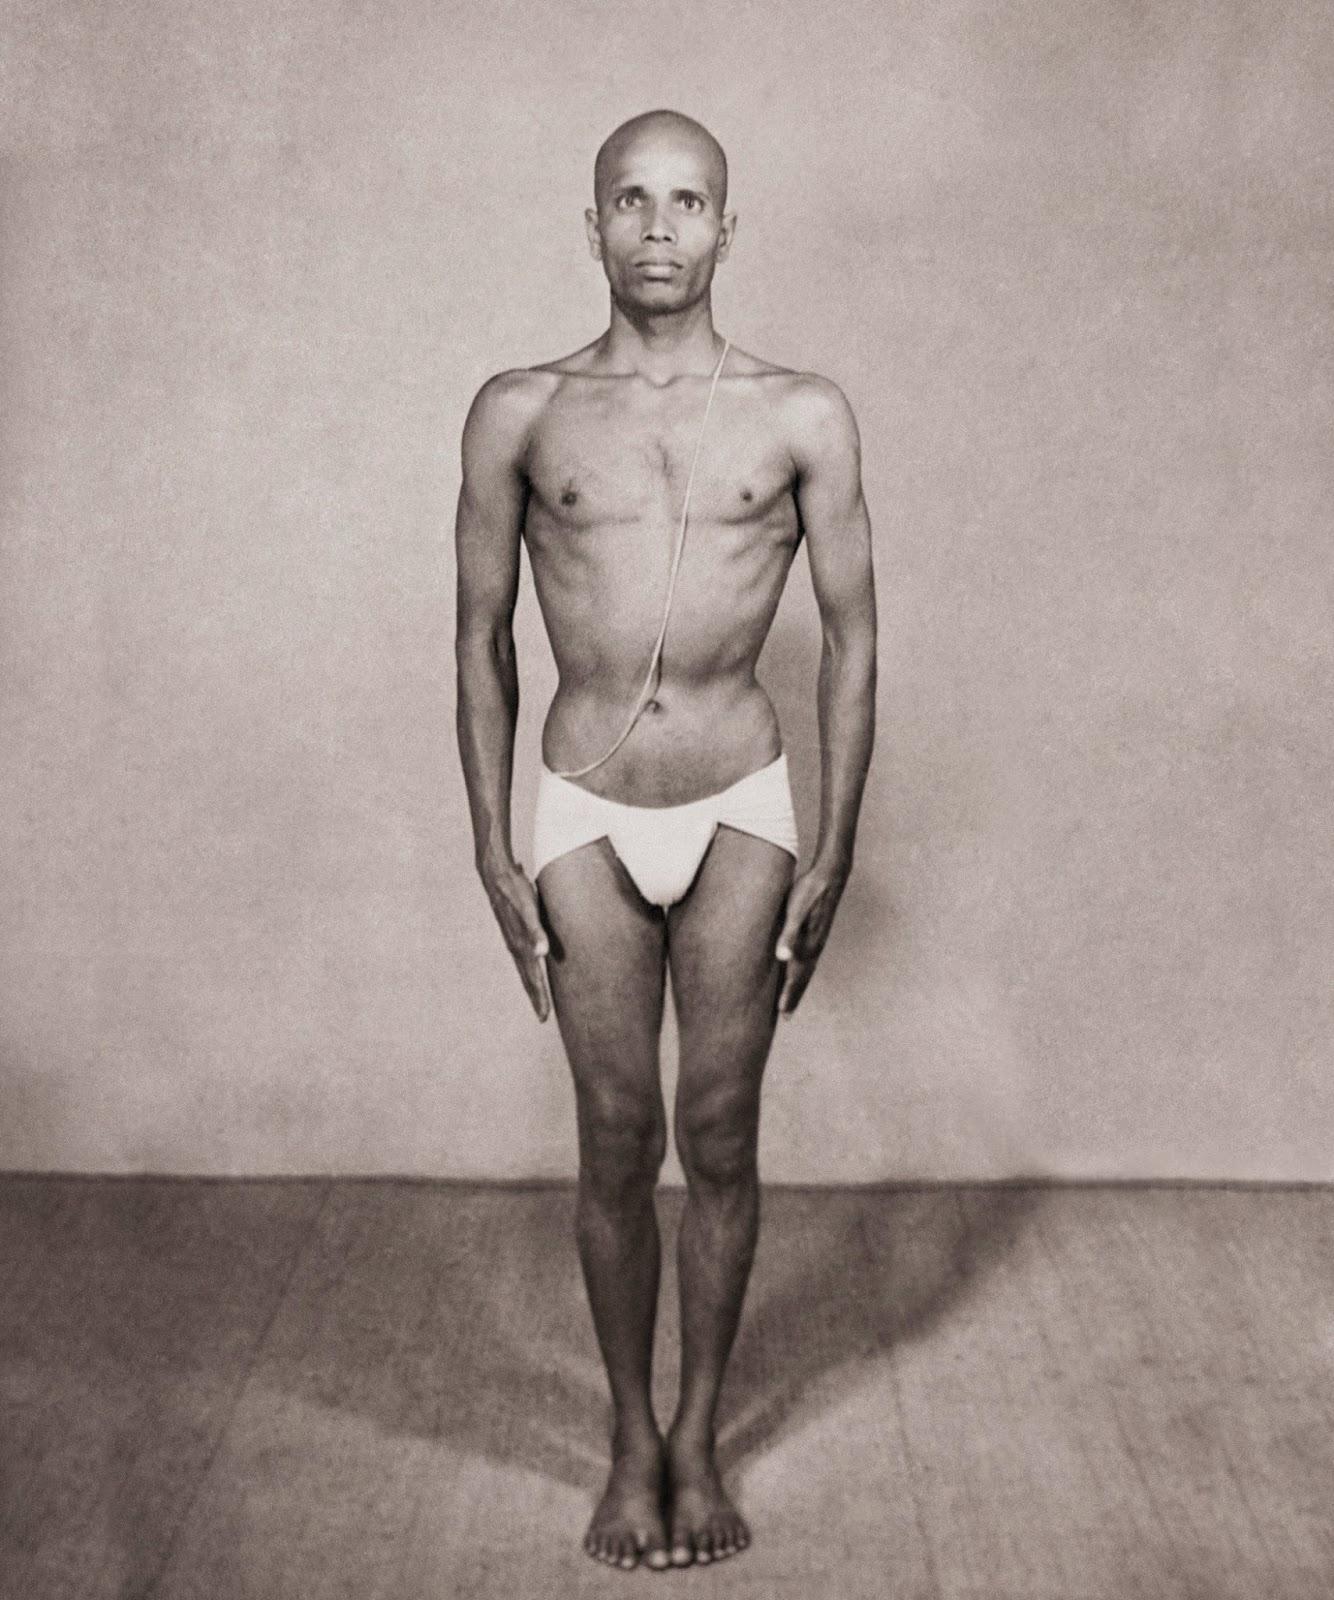 from Jedidiah gay sivananda yoga